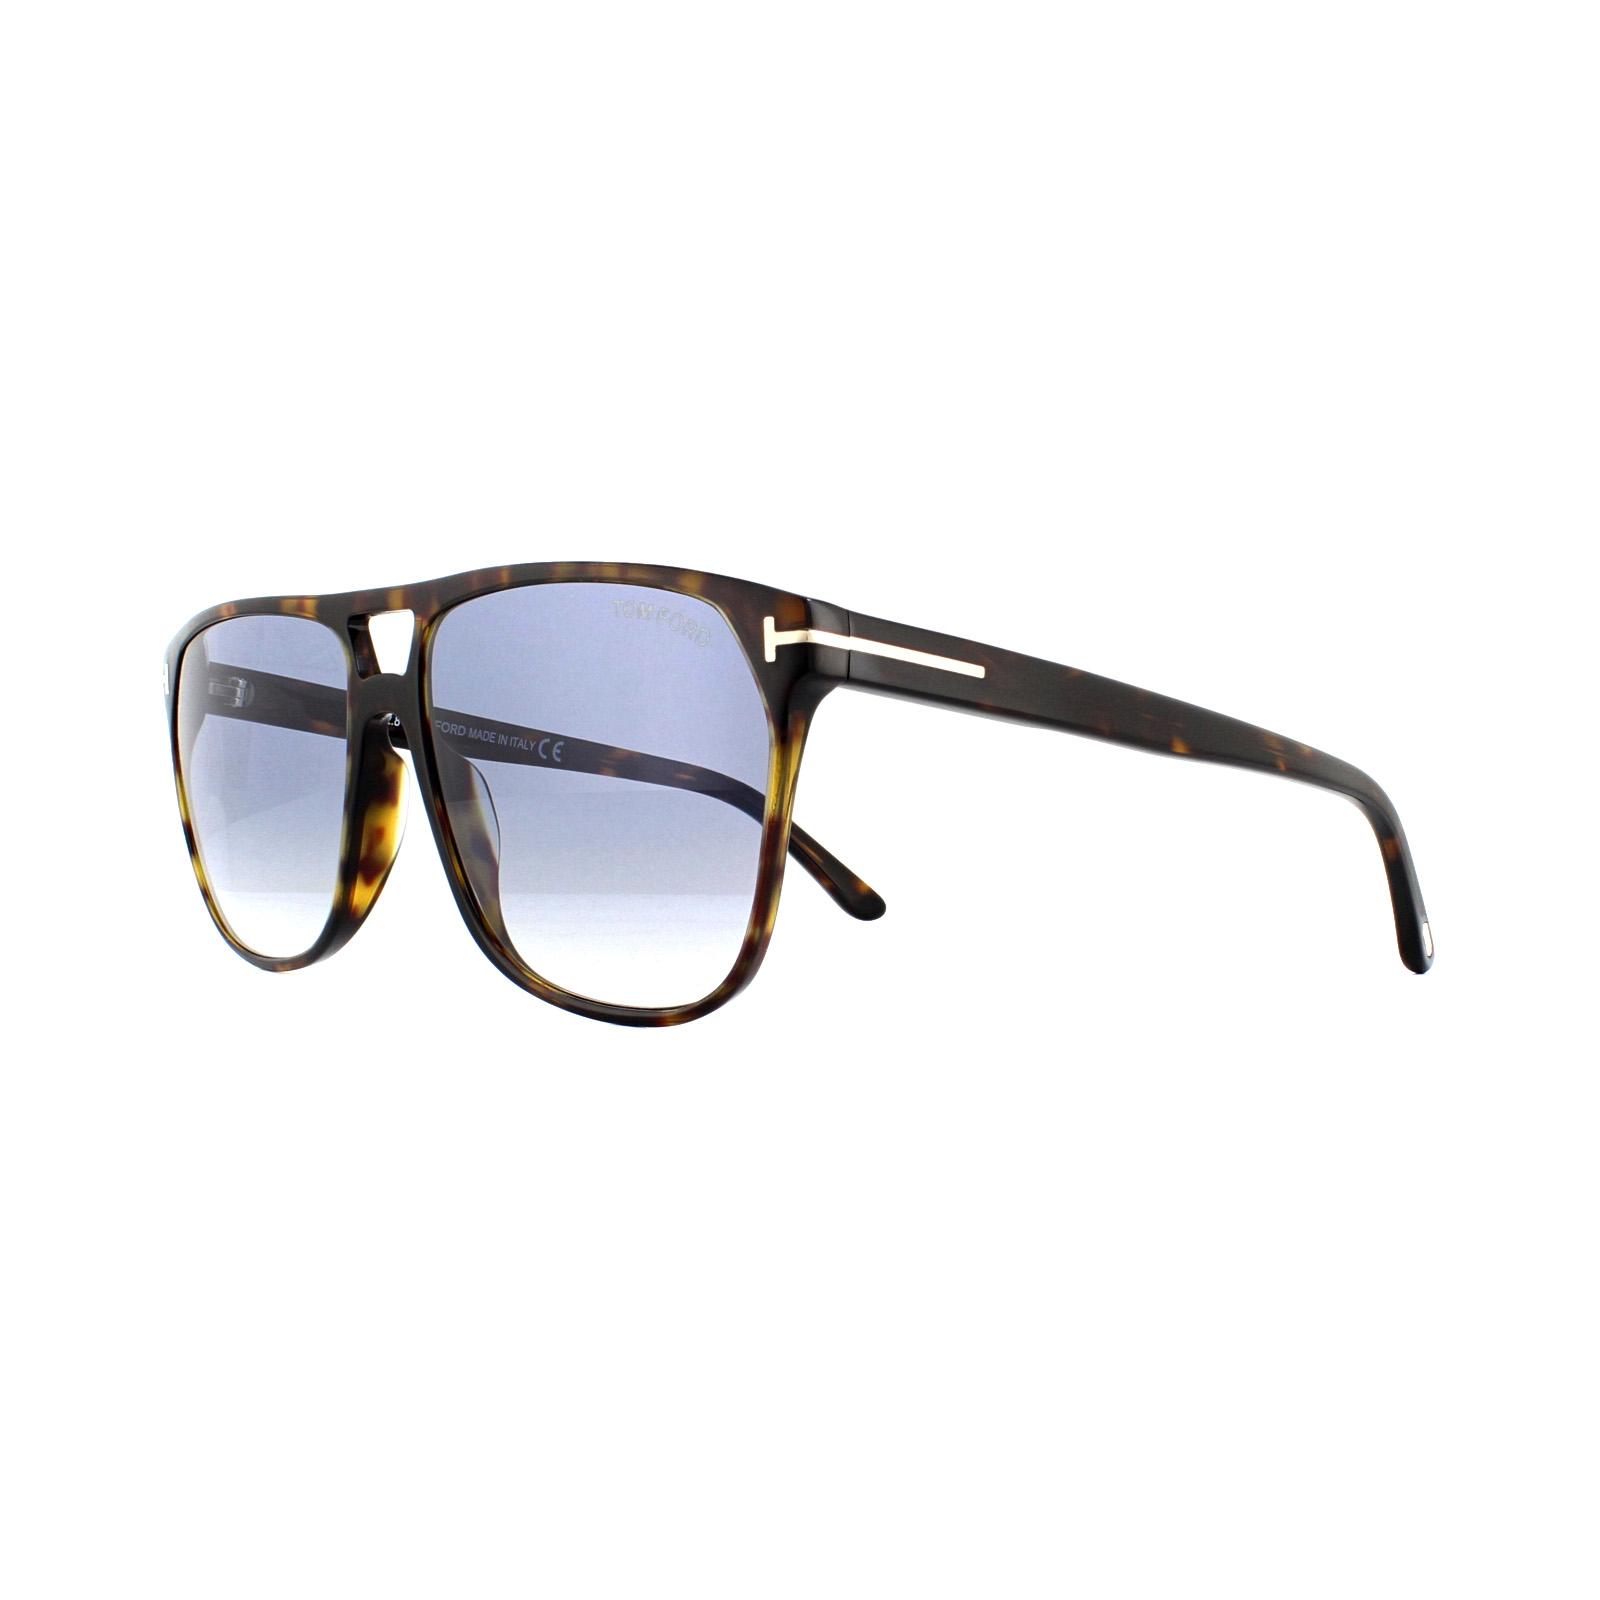 0a787297e209d Sentinel Tom Ford Sunglasses Shelton 0679 52W Dark Havana Blue Gradient